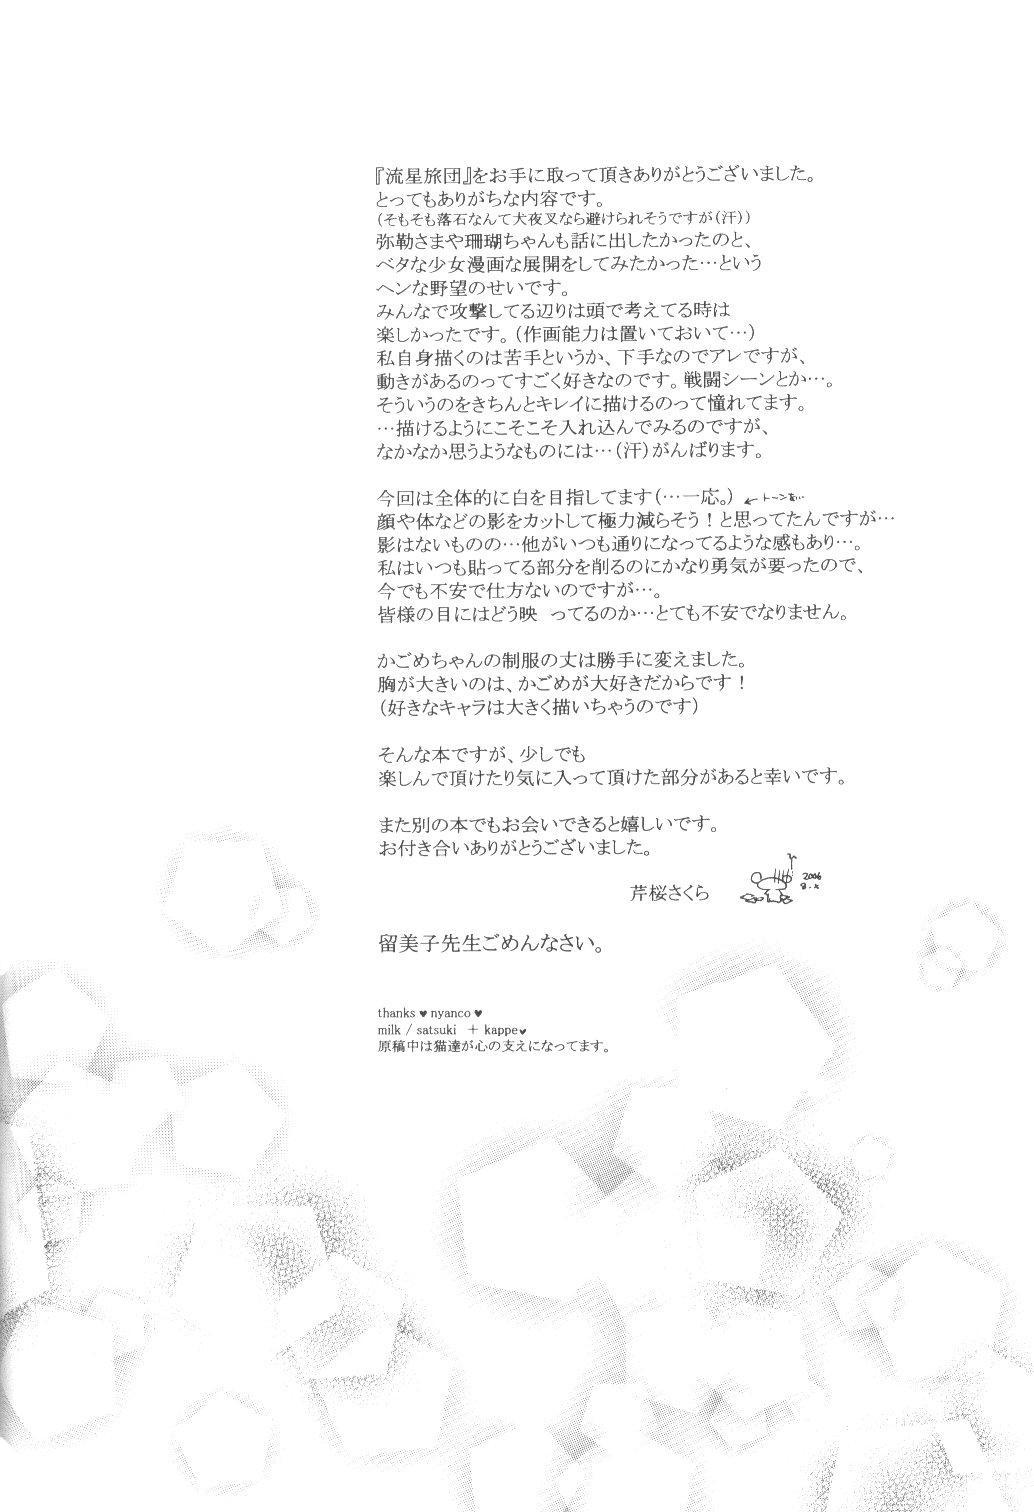 Ryuusei Ryodan 51